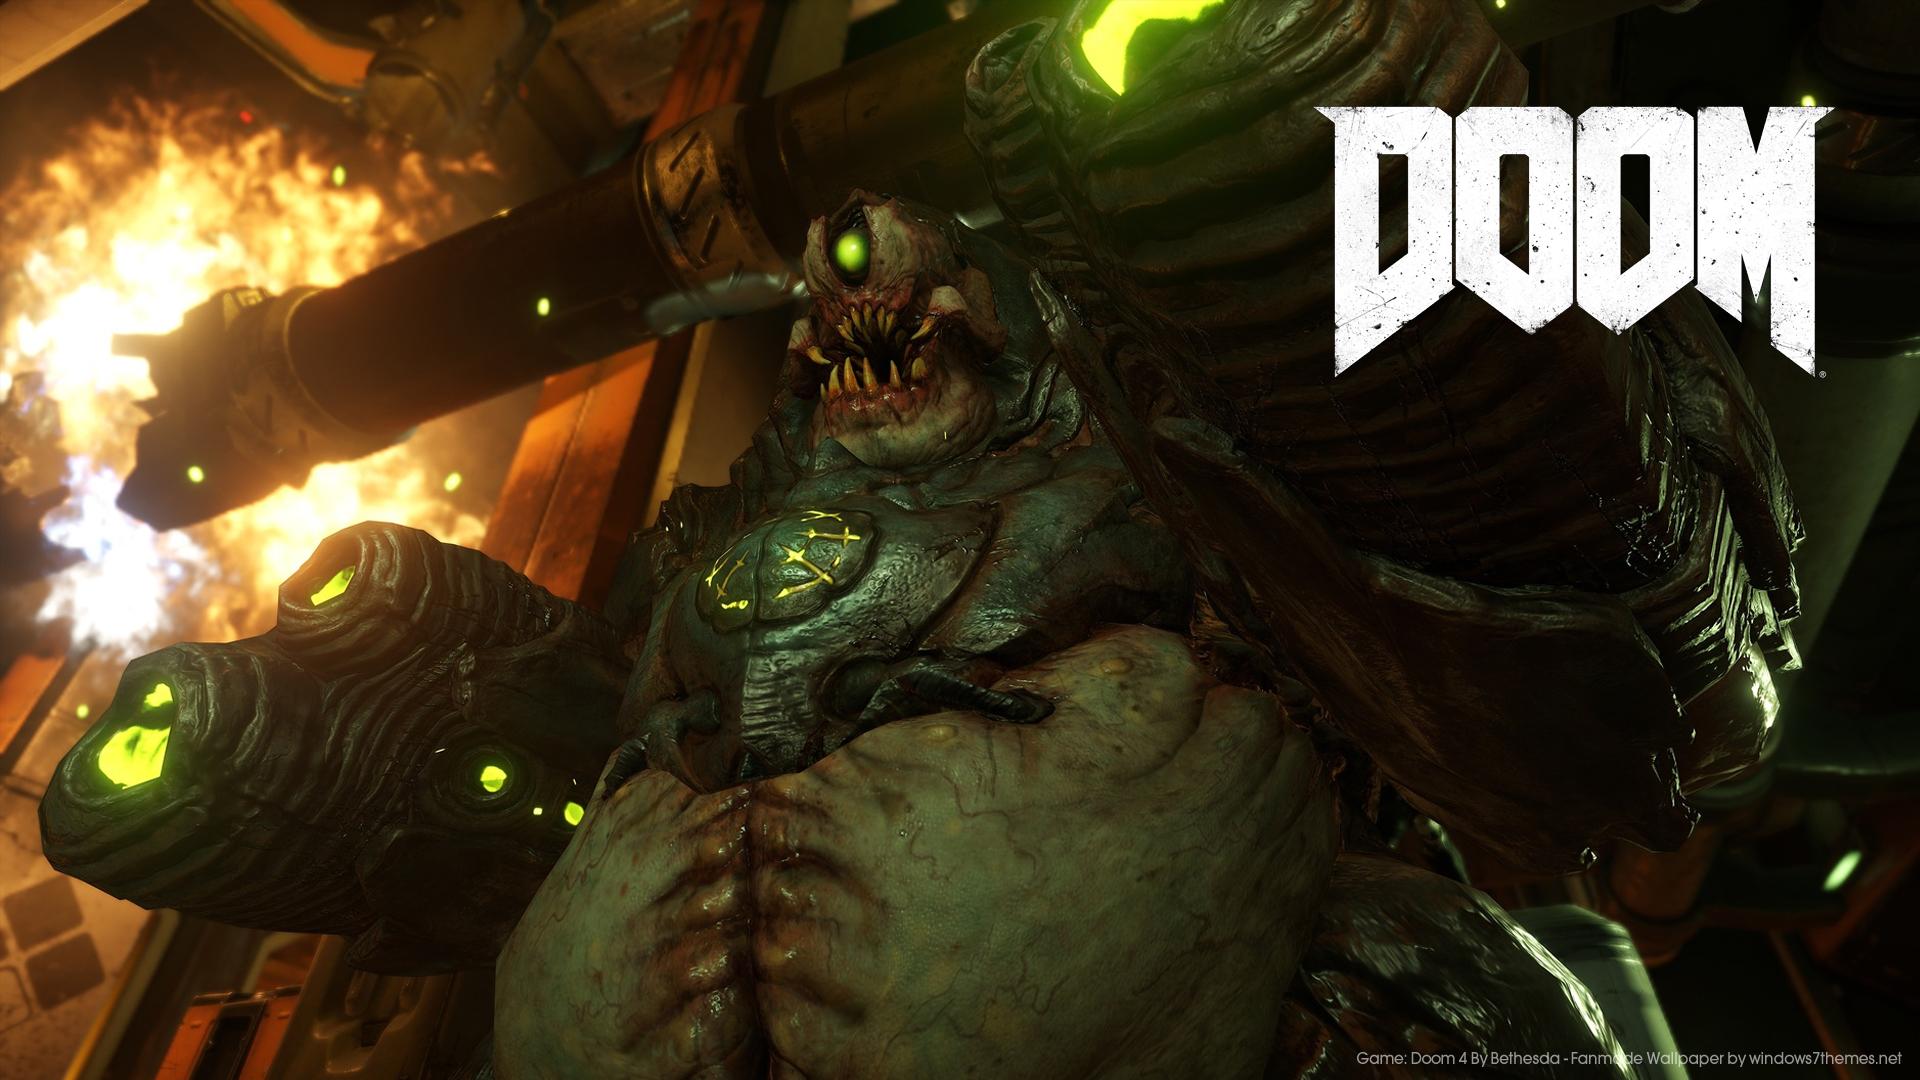 Free Download High Res Doom 4 Wallpapers For Your Desktop